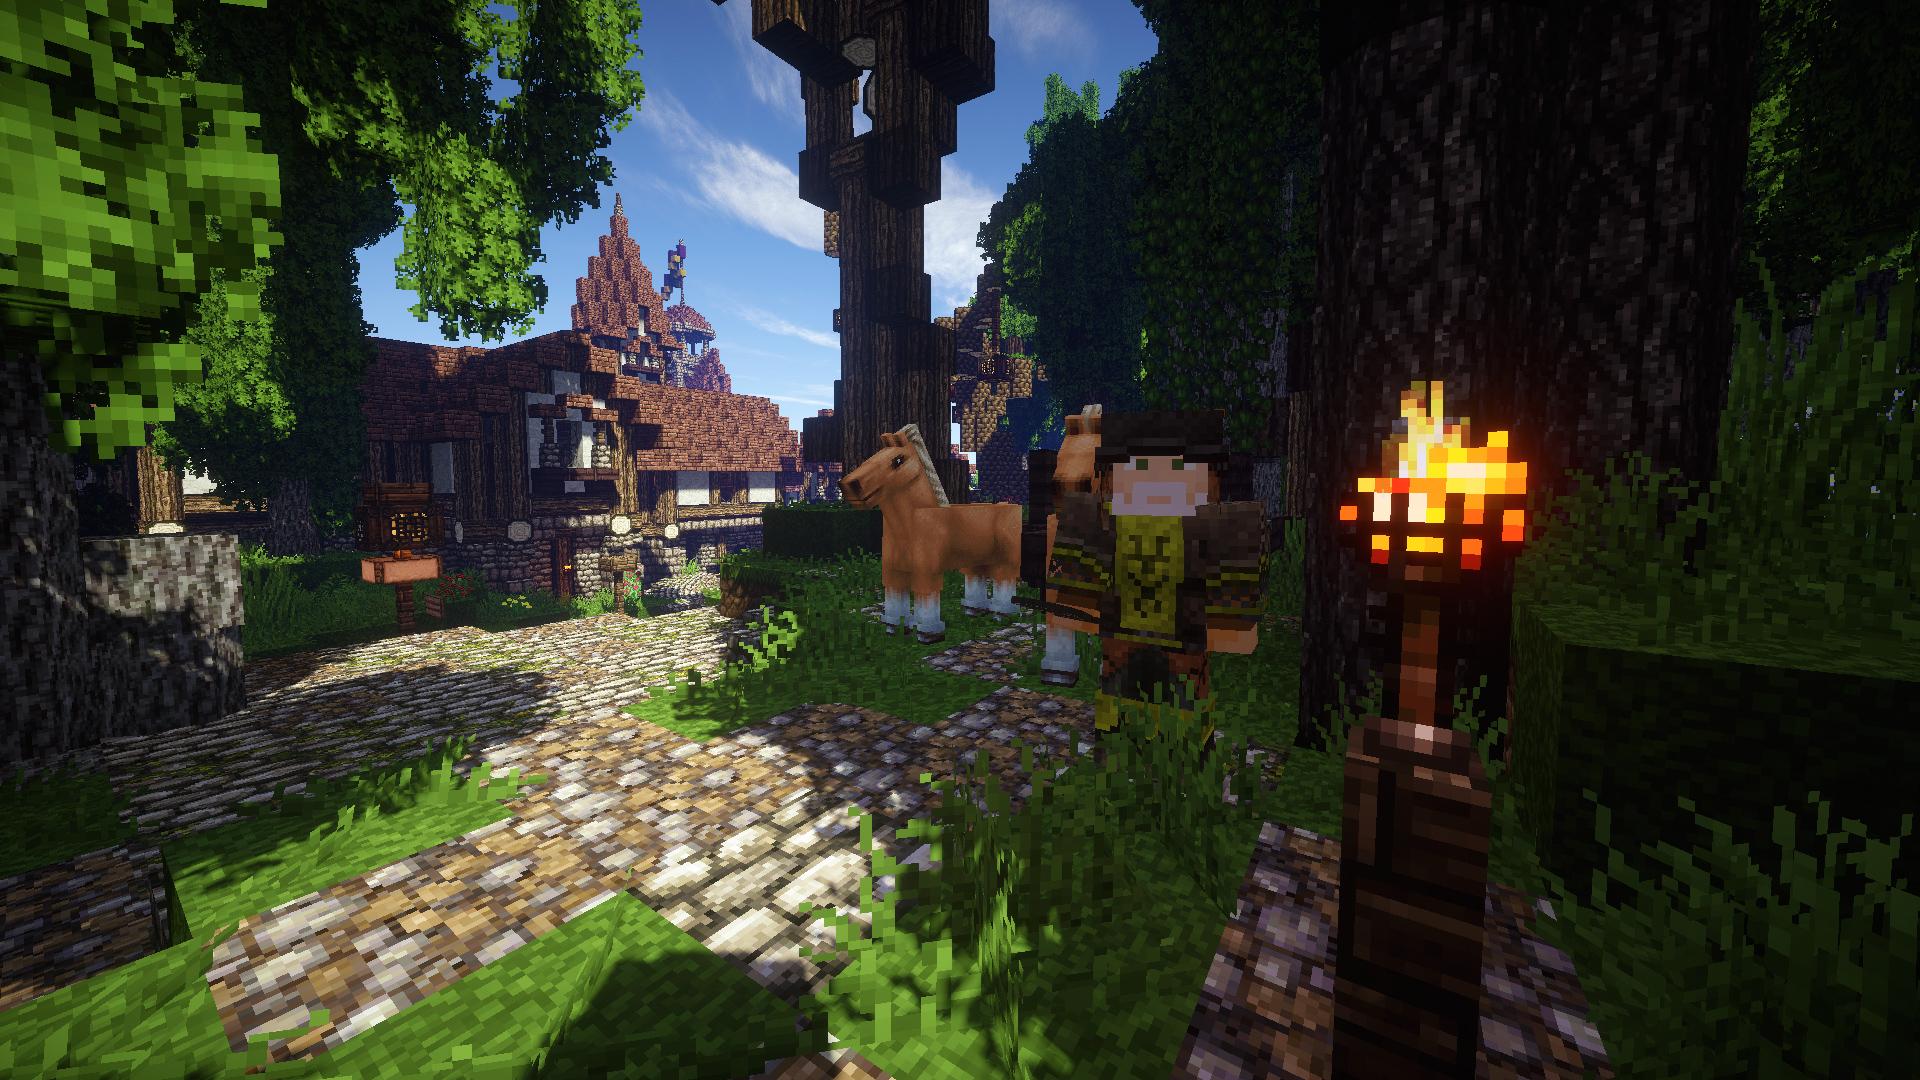 Minecraft Factions Server - MassiveCraft